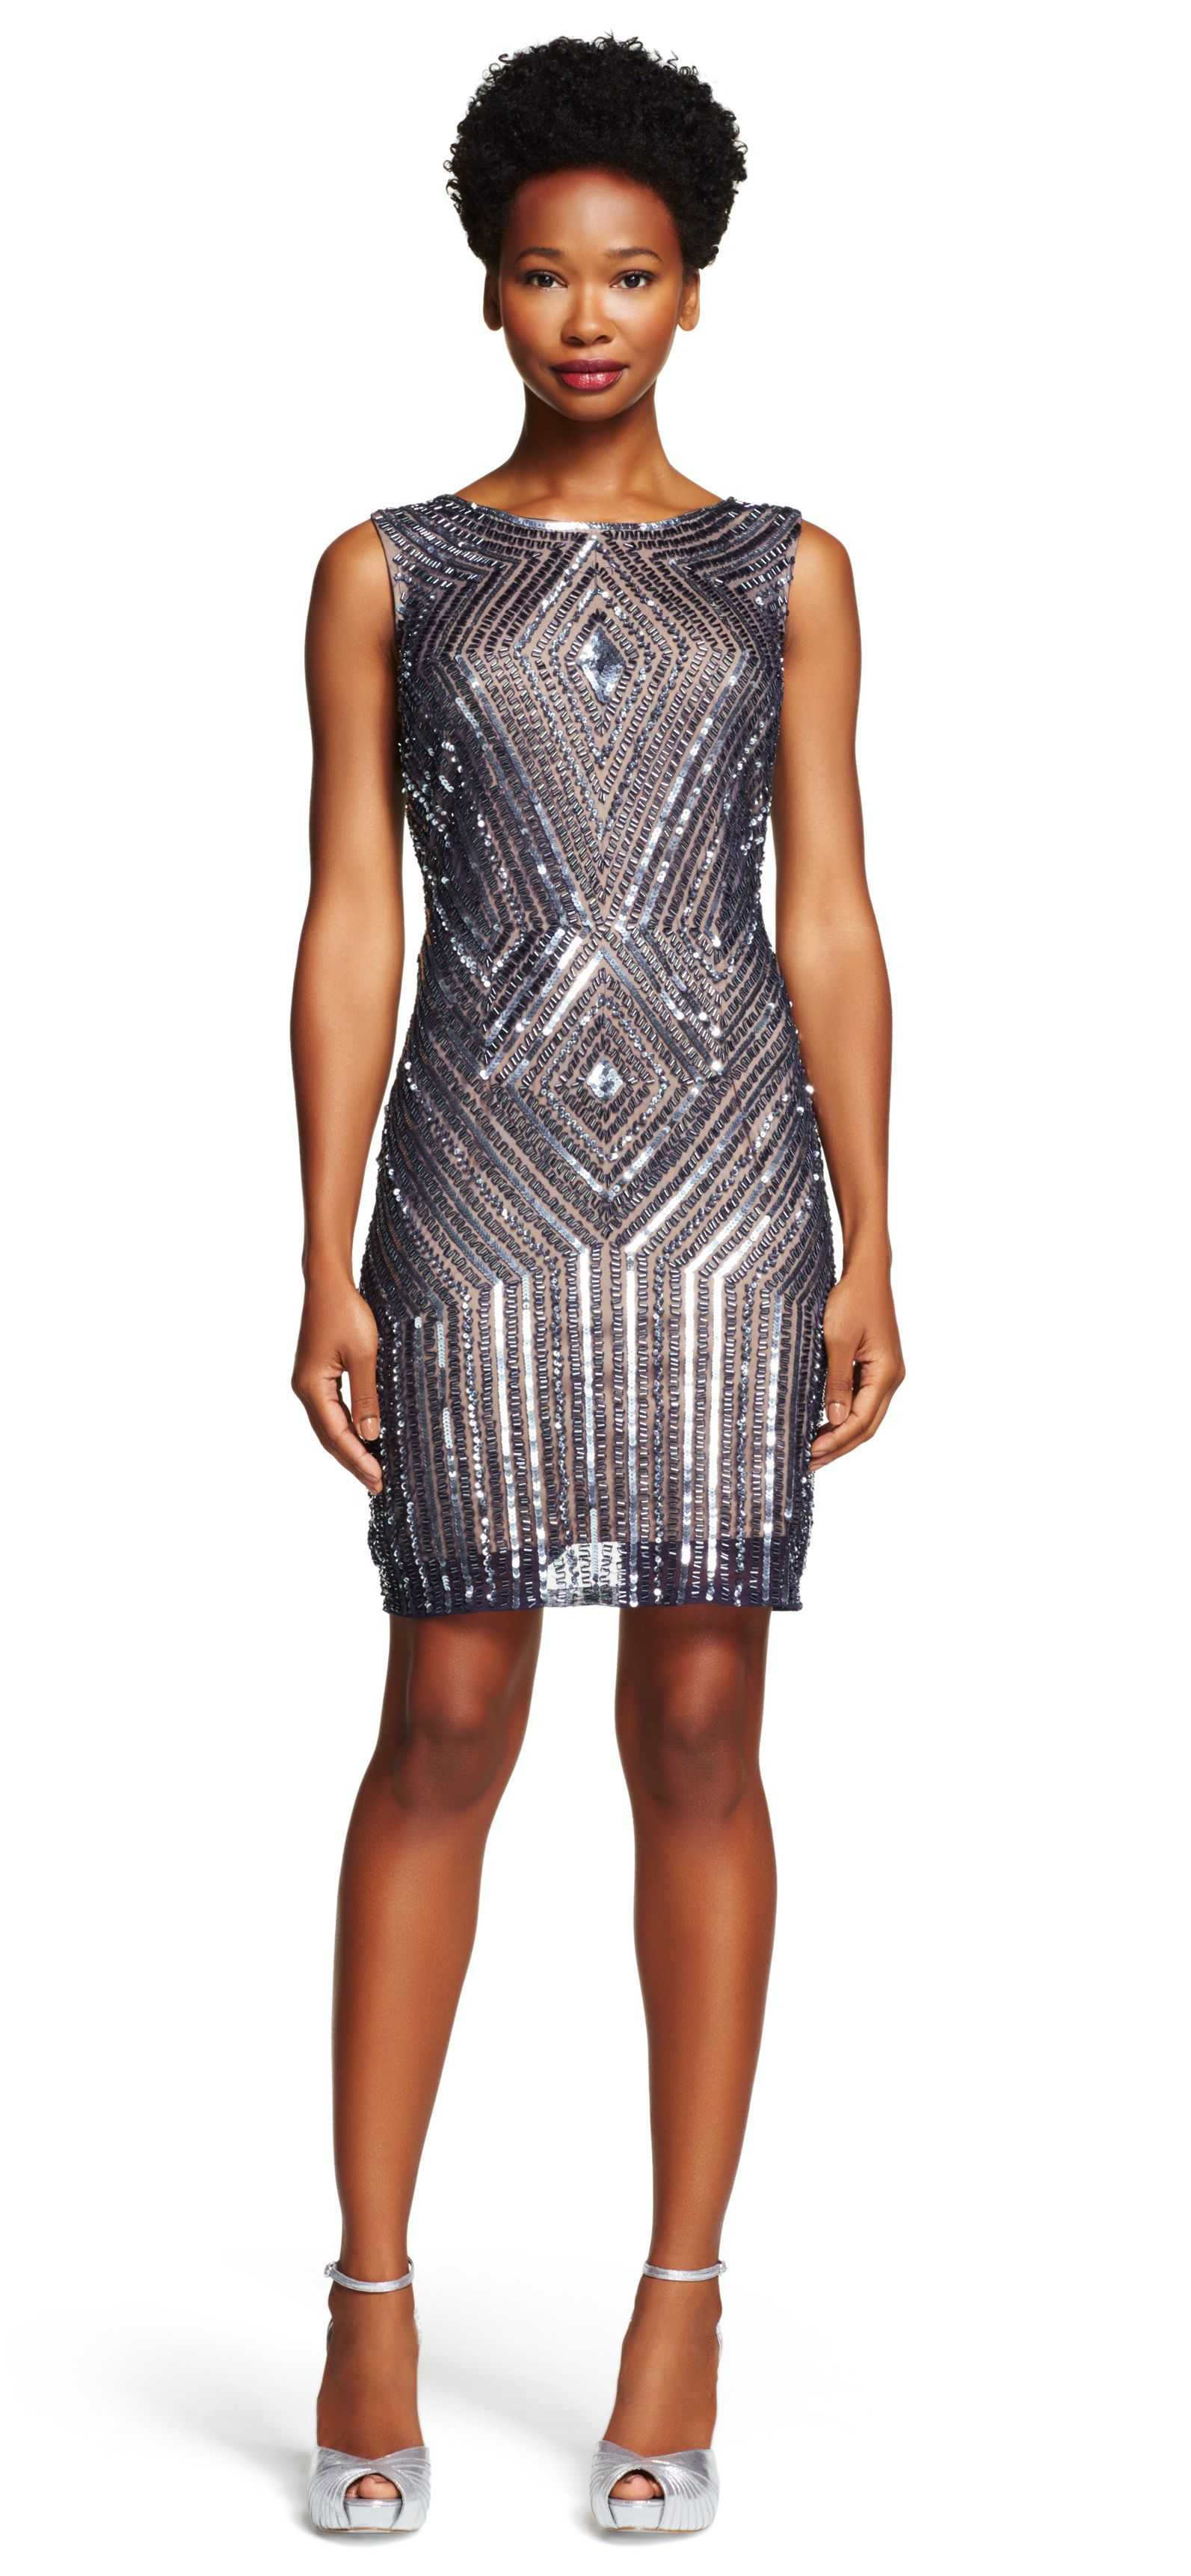 Sleeveless Fully Beaded Cocktail Dress - Adrianna Papell | vestidos ...